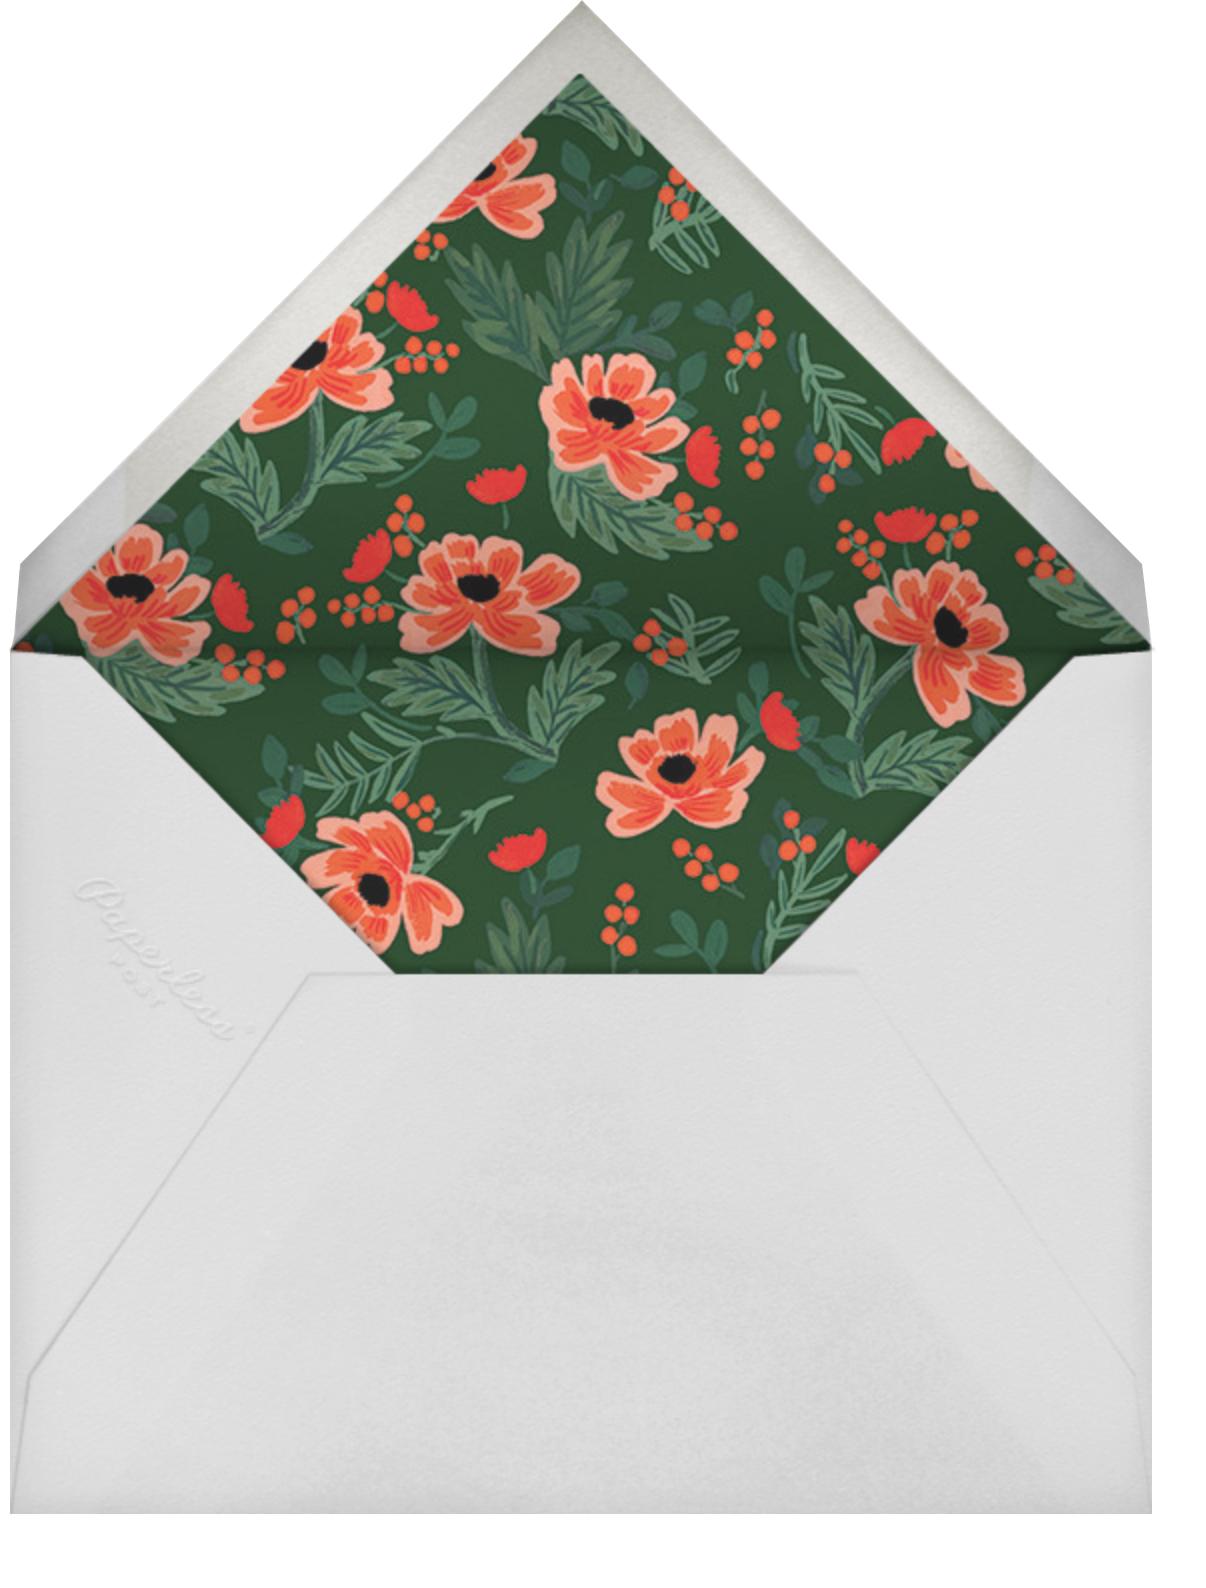 Field Poppies (Horizontal) - Rifle Paper Co. - Envelope